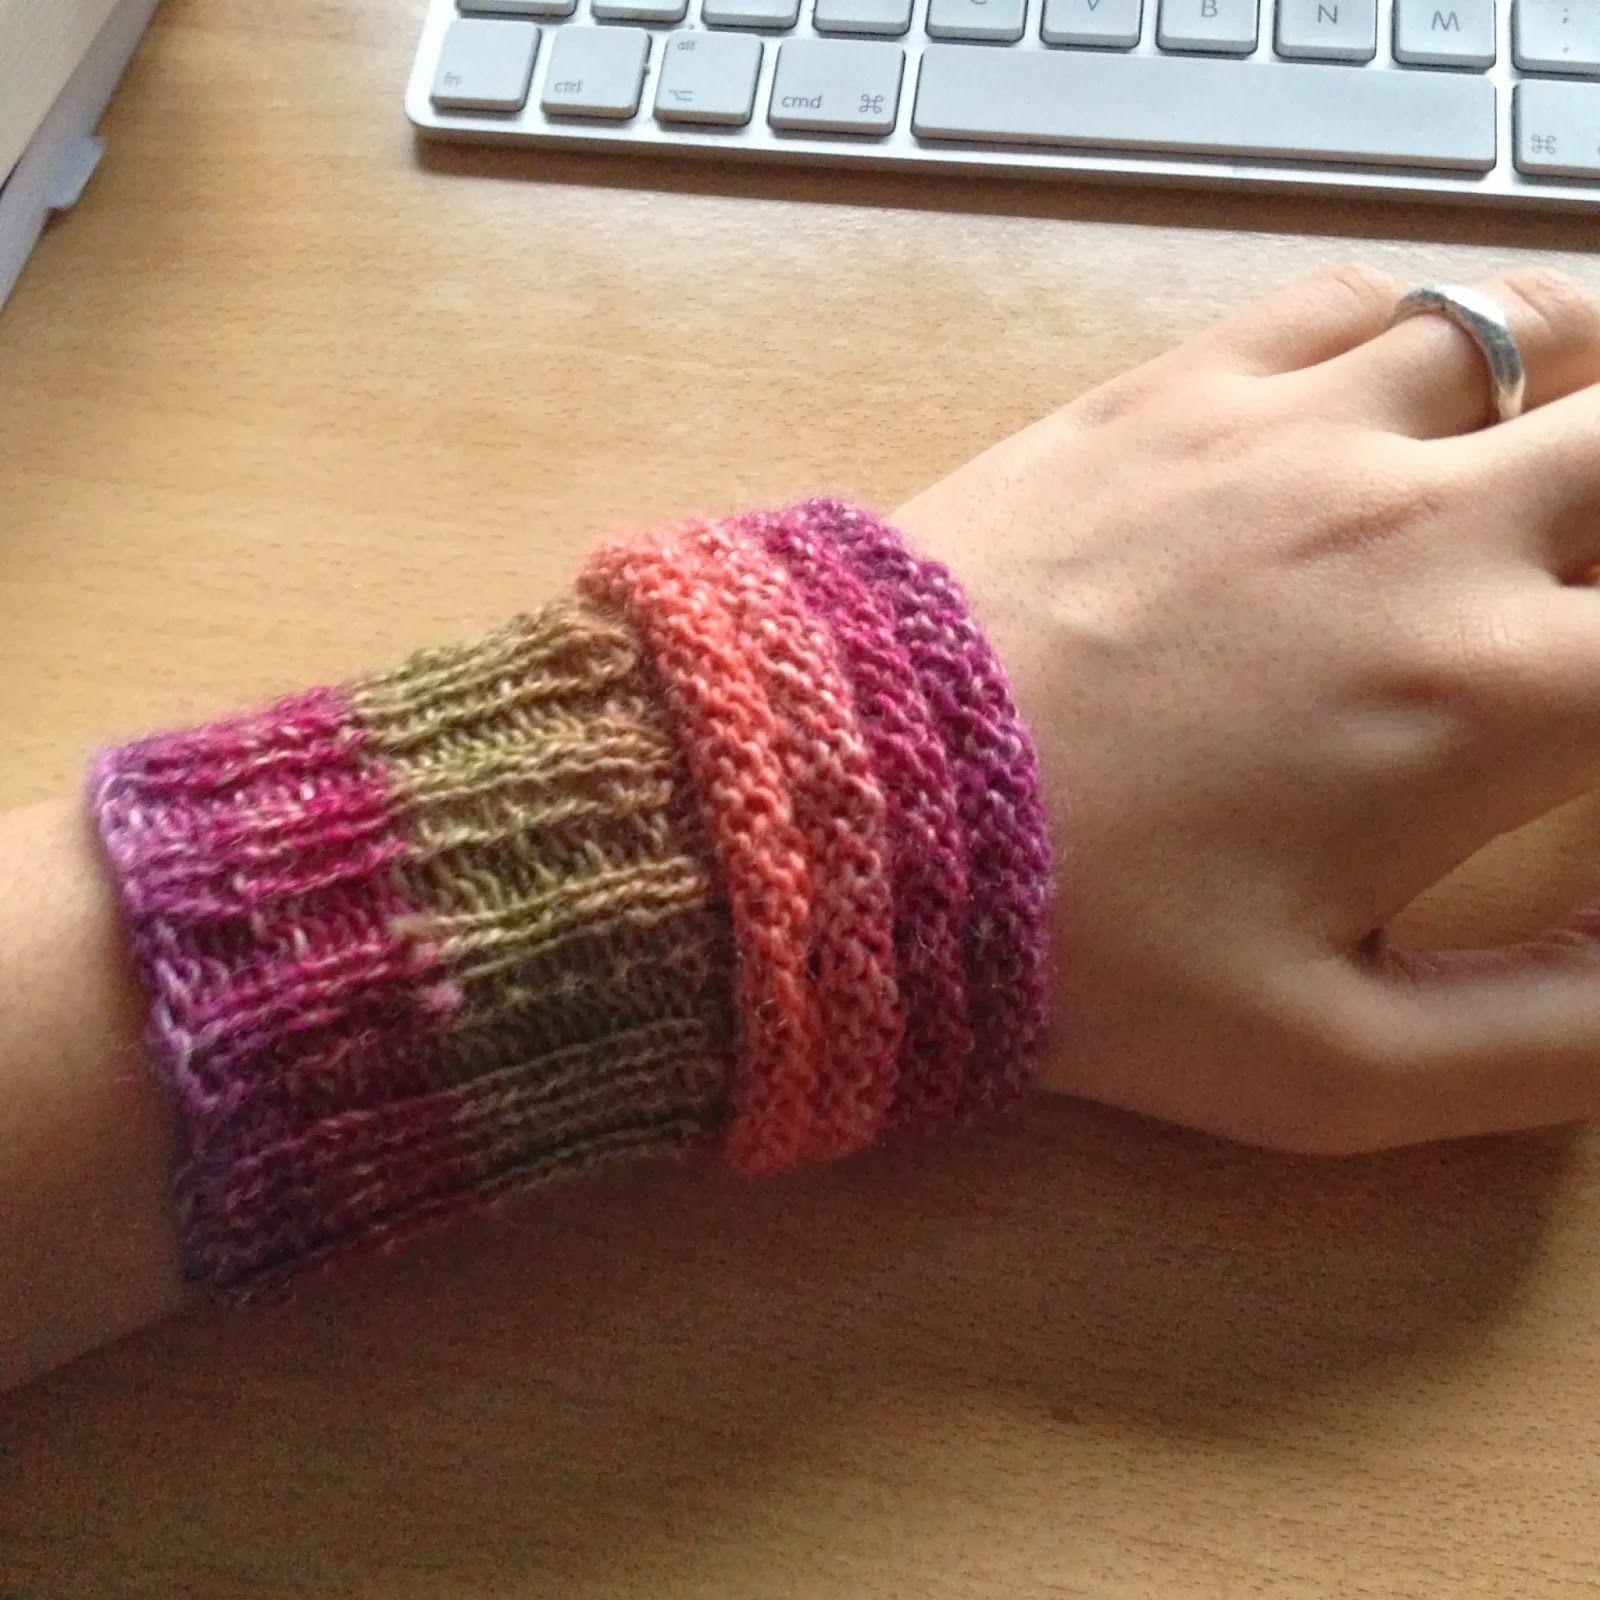 Harri ♡ sewing: Kostenlose Anleitung: Super einfache Mojo ...